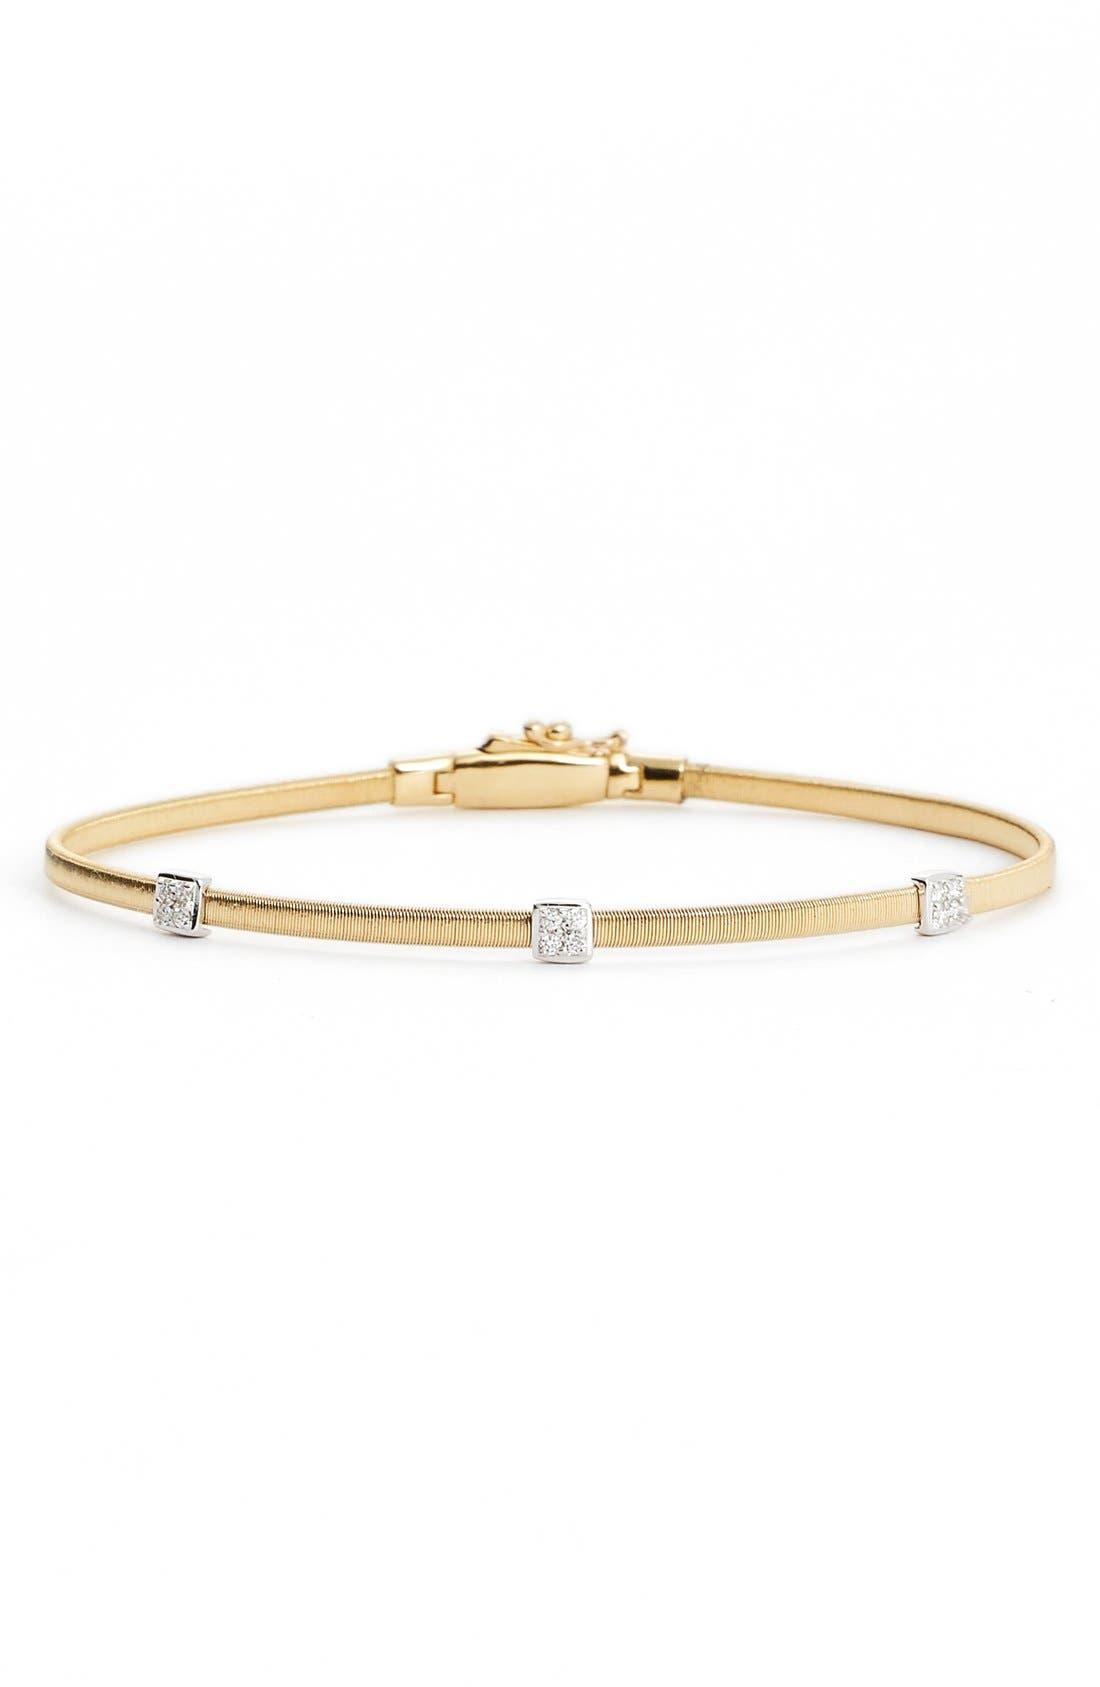 Masai Small Station Diamond Bracelet,                         Main,                         color, Yellow Gold